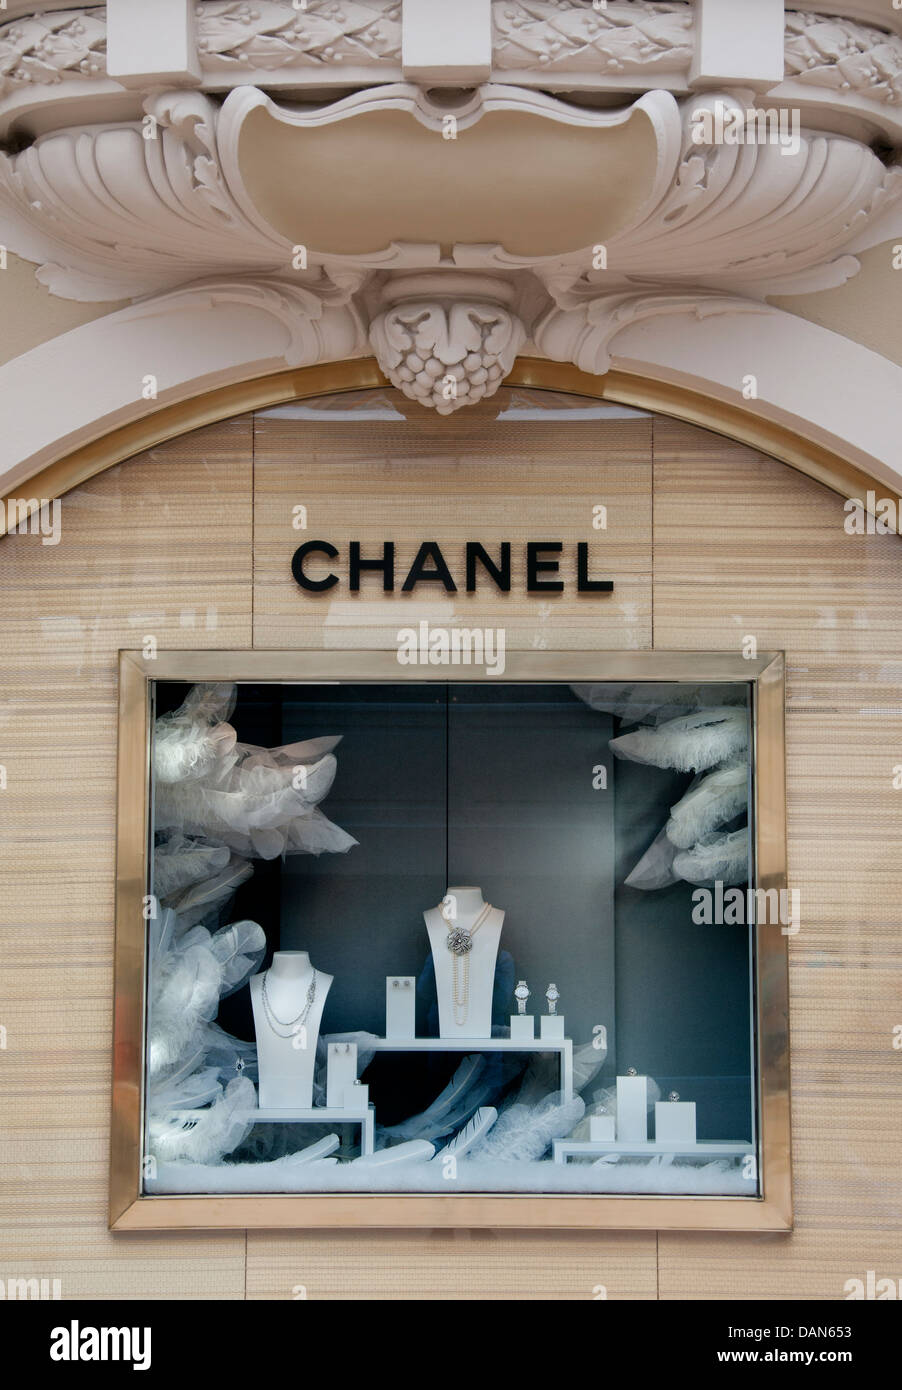 Coco Chanel Mónaco Riviera Francesa Joyas joyas Francia Imagen De Stock